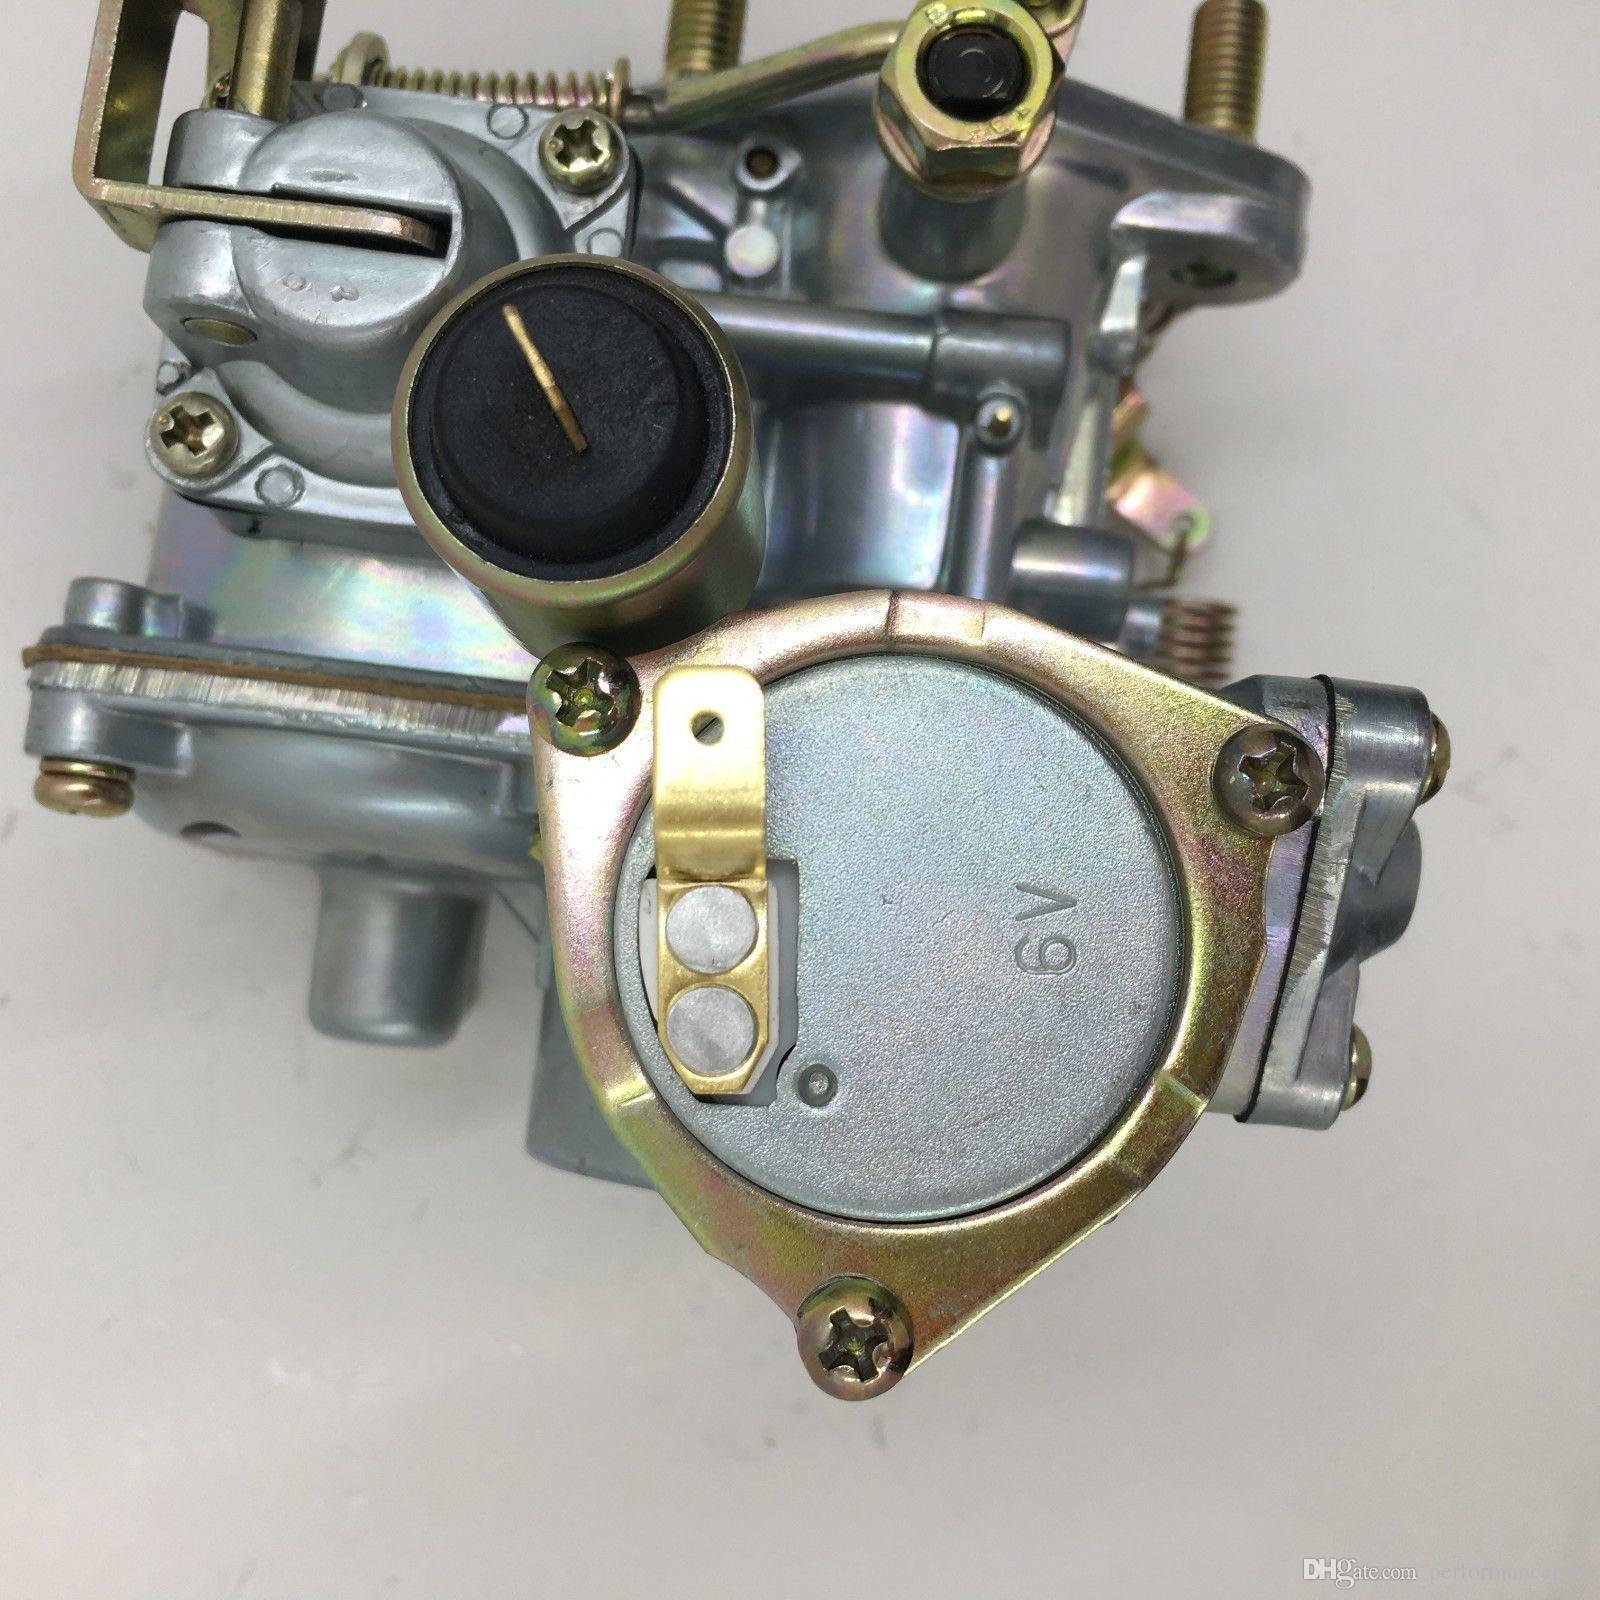 hight resolution of 2019 30pict 1 carburetor electric choke fit vw beetle carburator bug solex empi 6v from performancepart 90 45 dhgate com